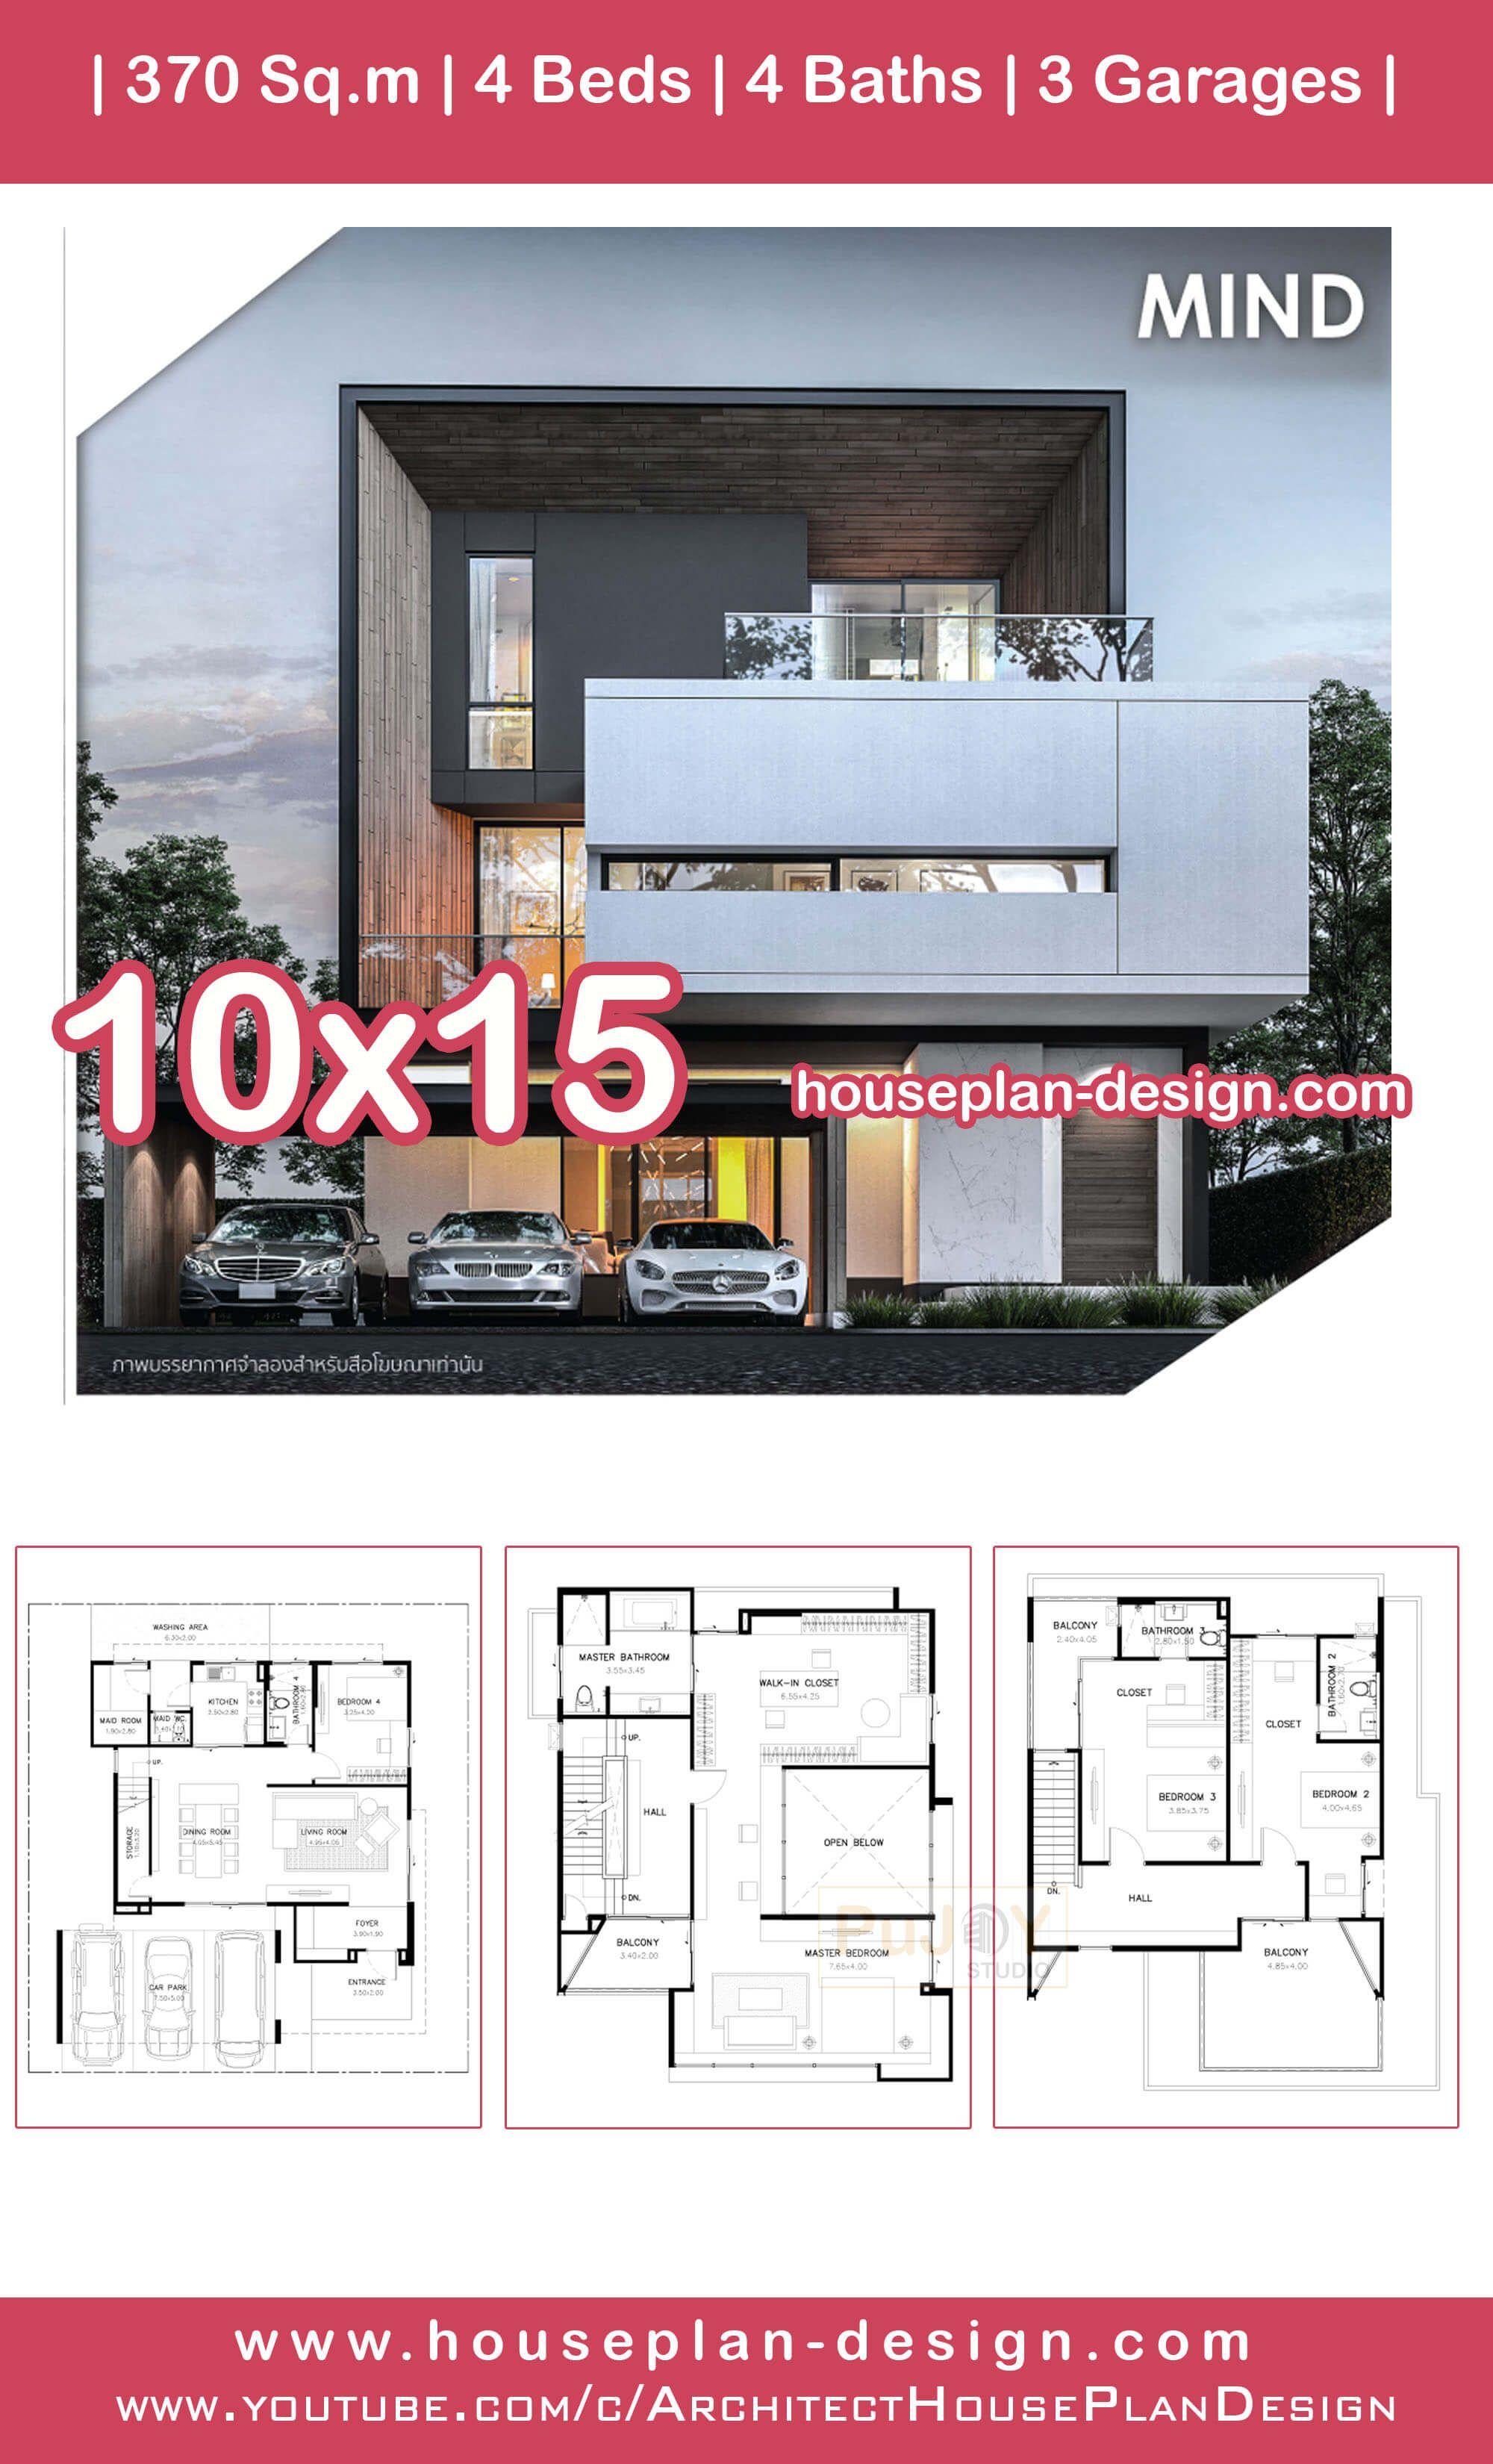 House Plan Design Modern House Plan 10x15m 4 Bedrooms House Plans Modern House Plan Modern Contemporary House Plans